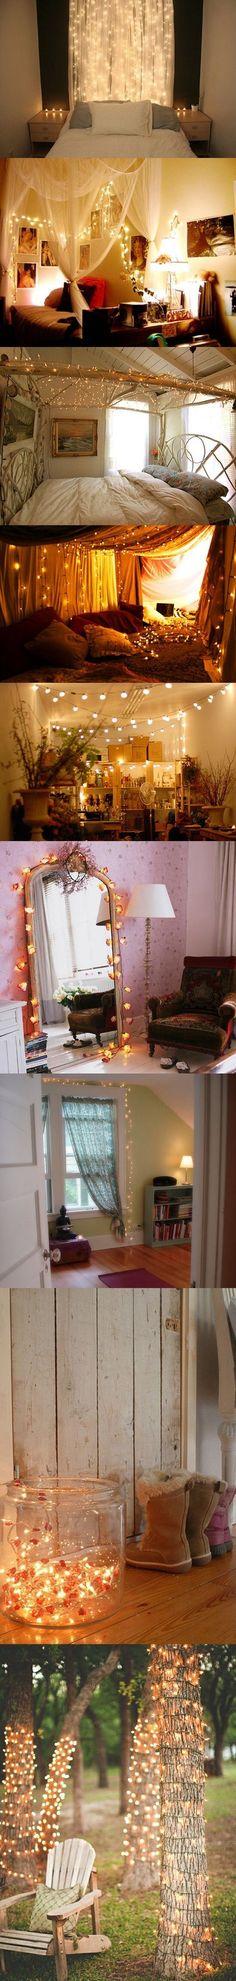 Twinkling lights home decor